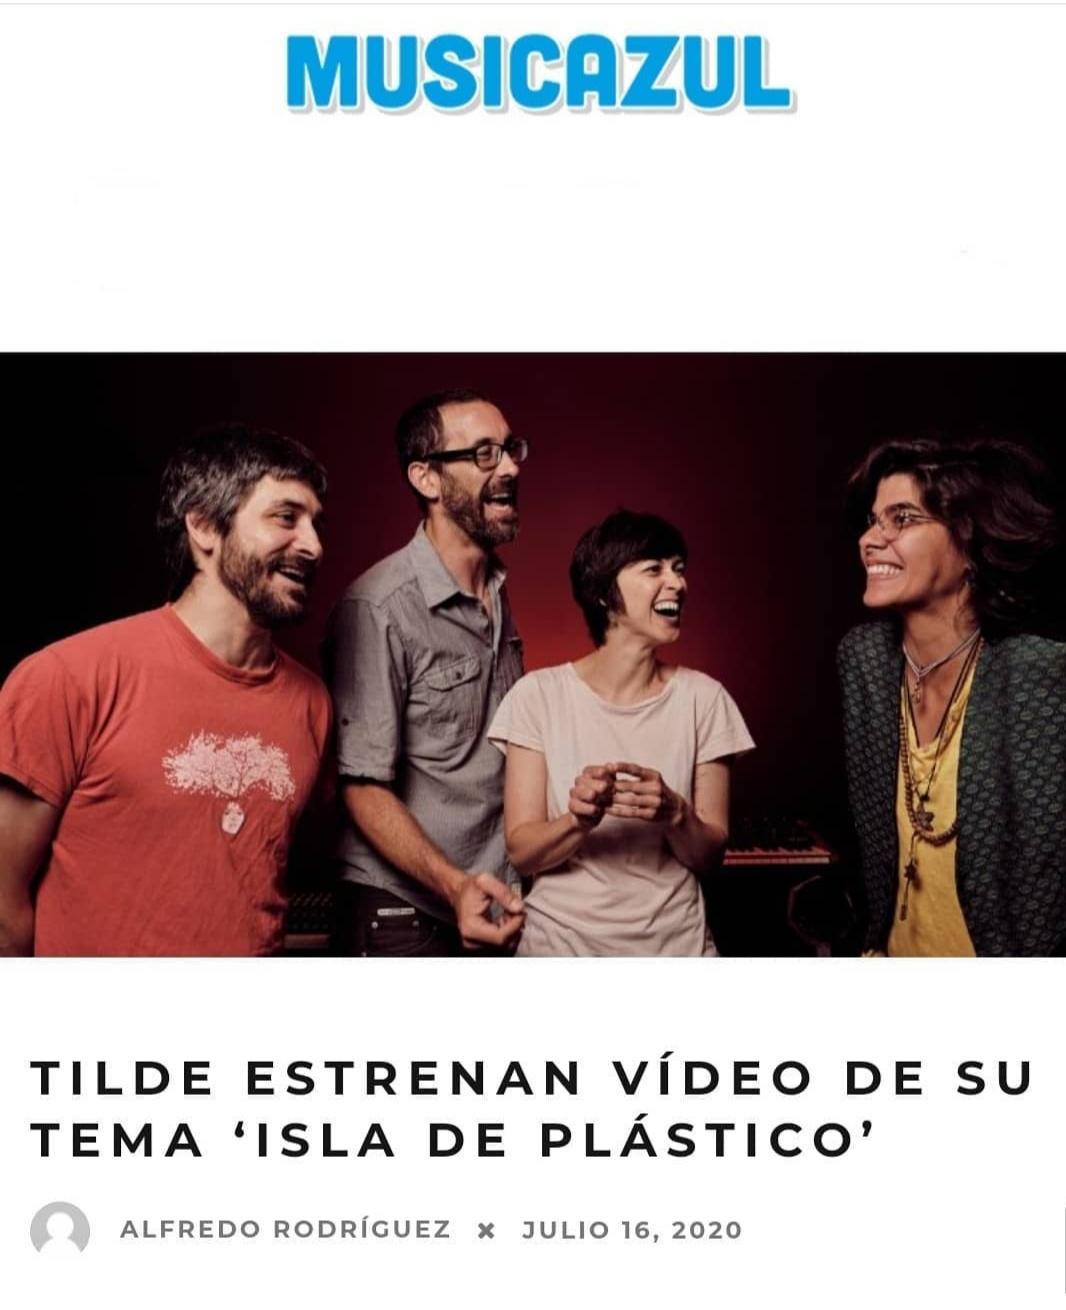 Foto promo Musicazul